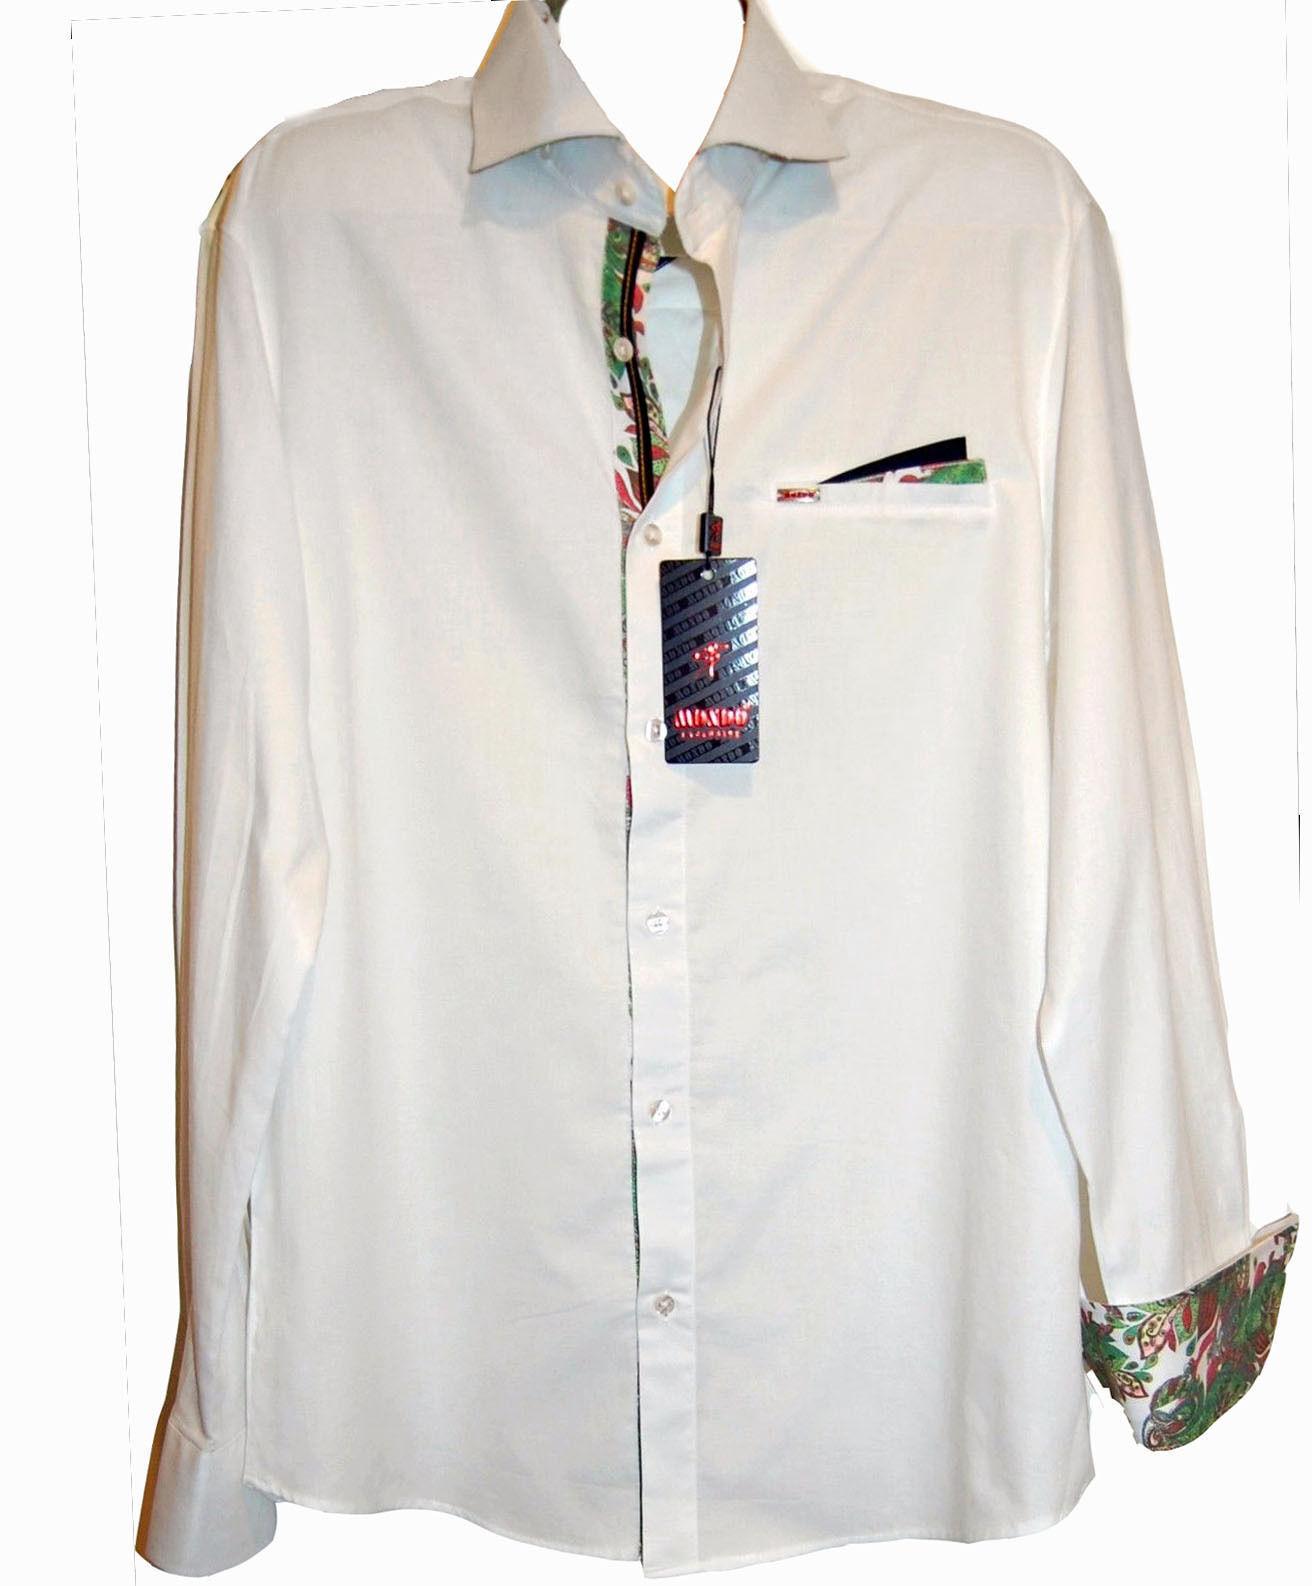 Mondo White Green Floral Lining Cotton Fancywork Men's Dress Shirt Size 3XL NEW